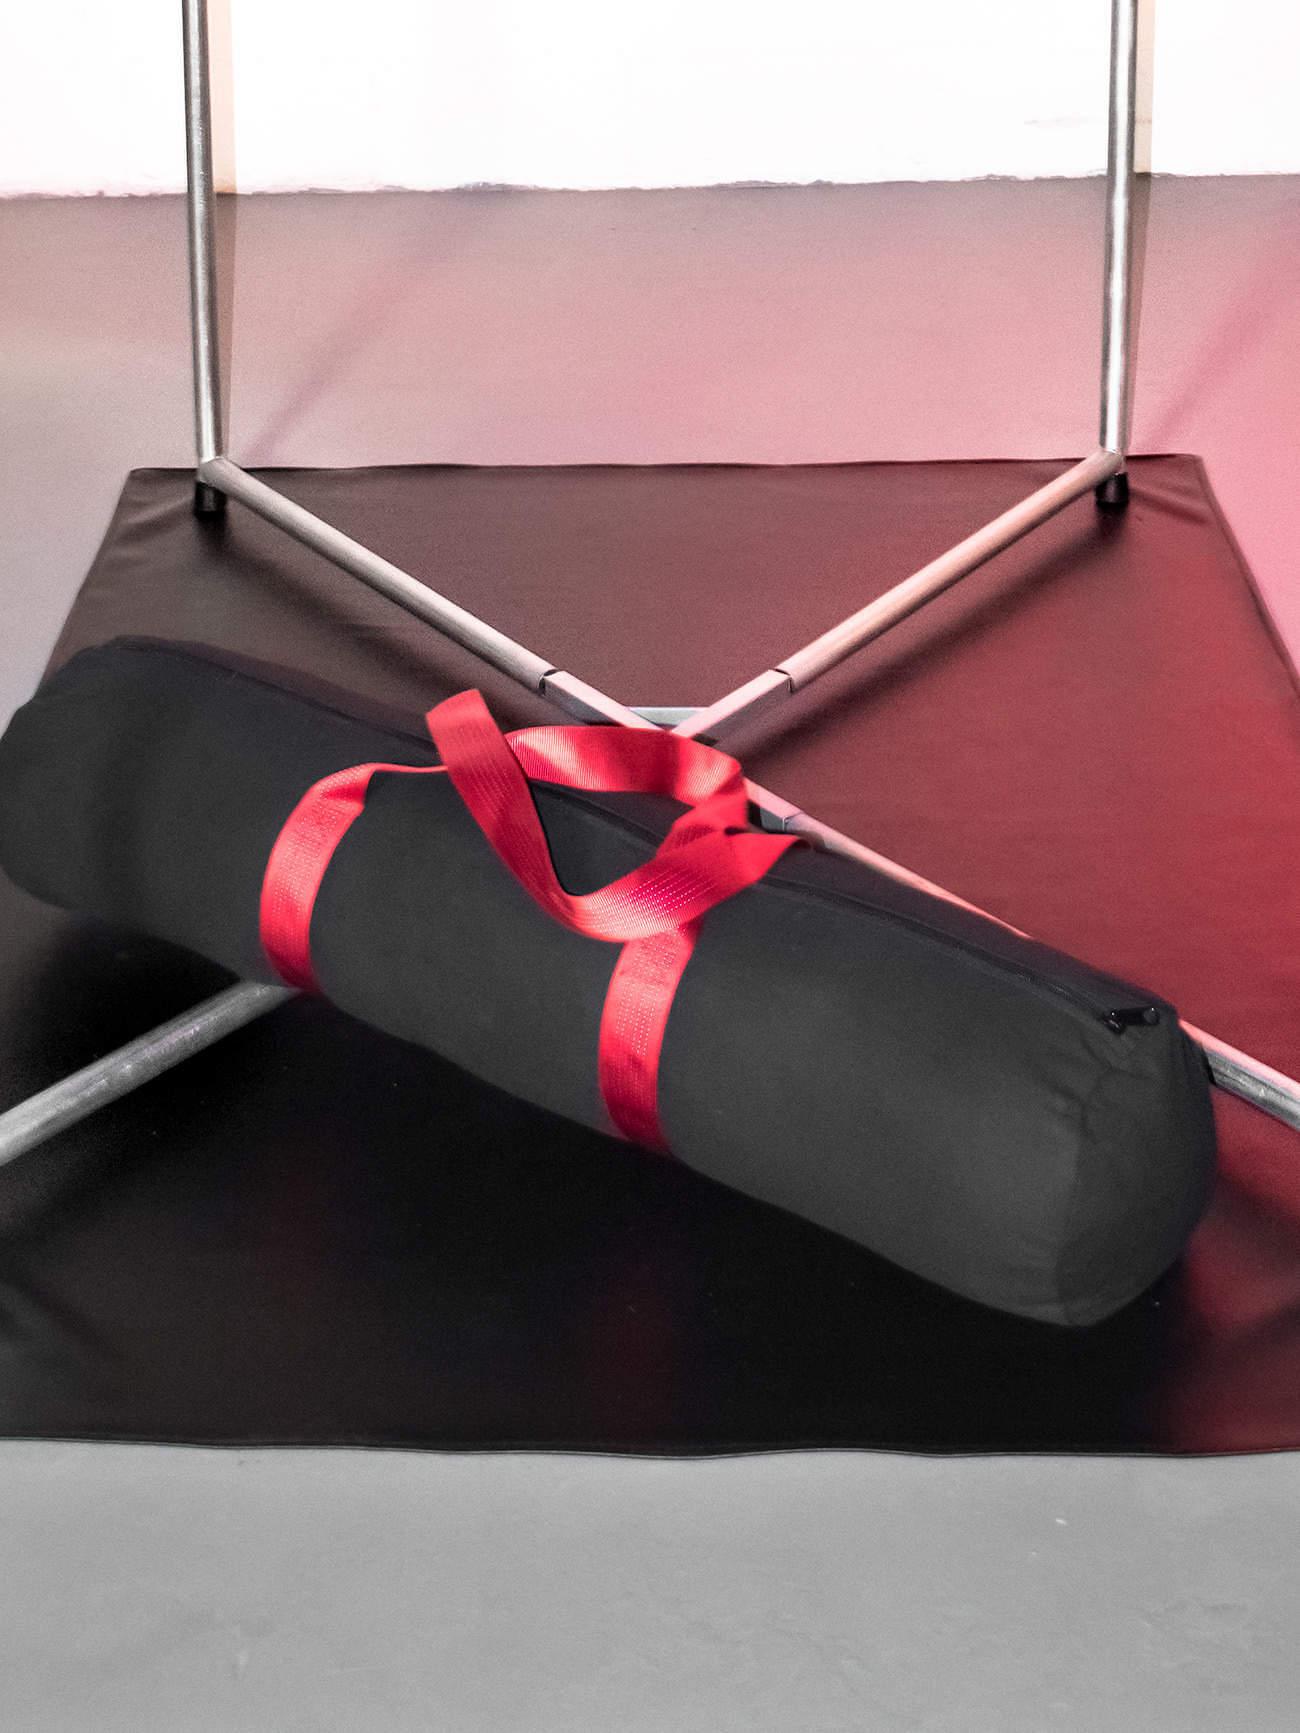 JimSupport Model X Porta Sling Frame Bag